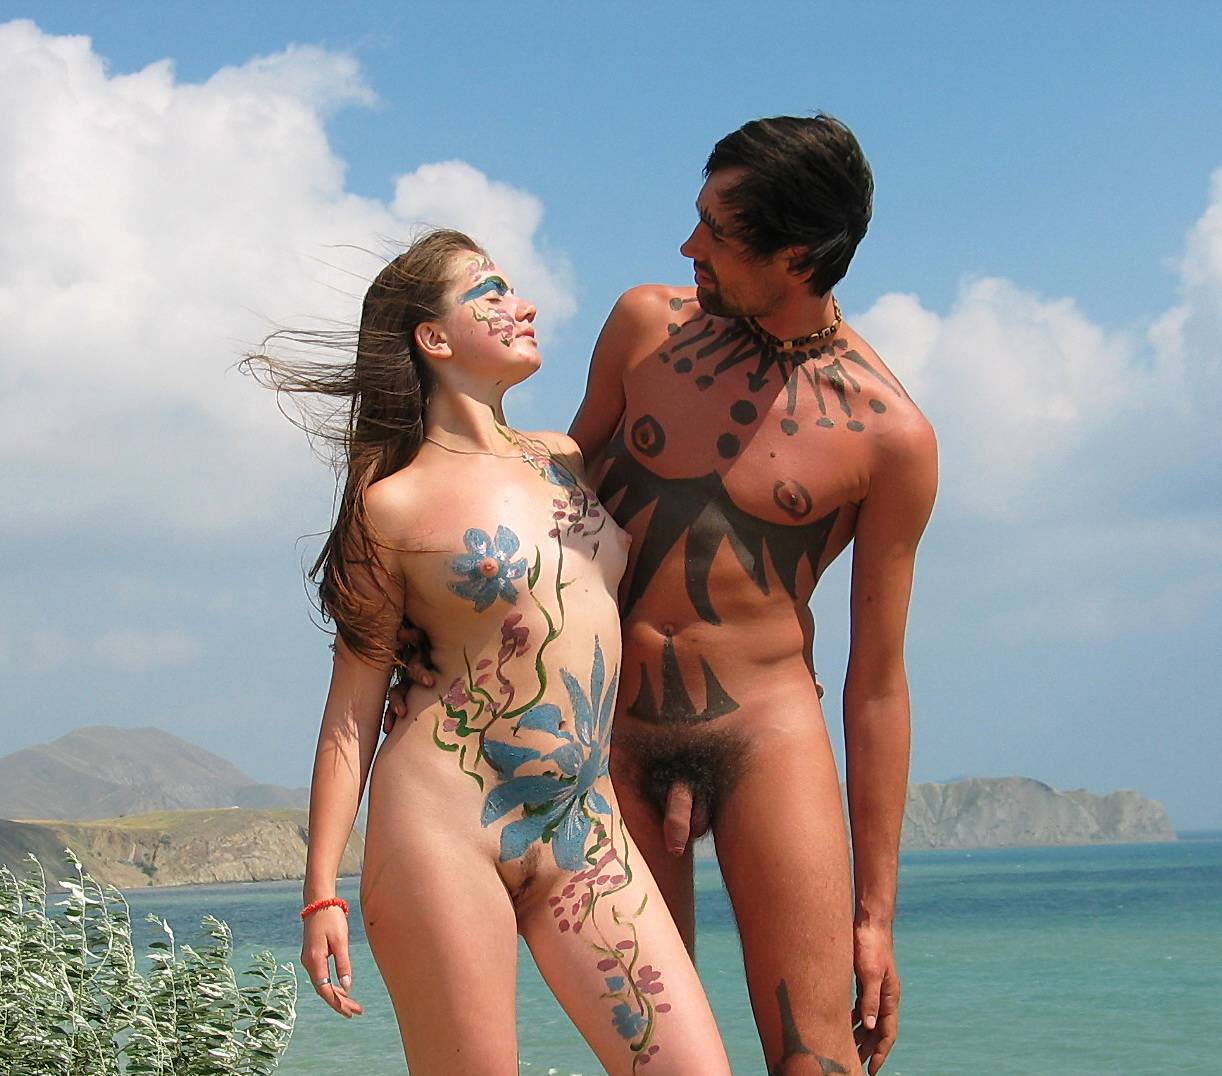 Nudist Pics Tropical Paradise Getaway - 1